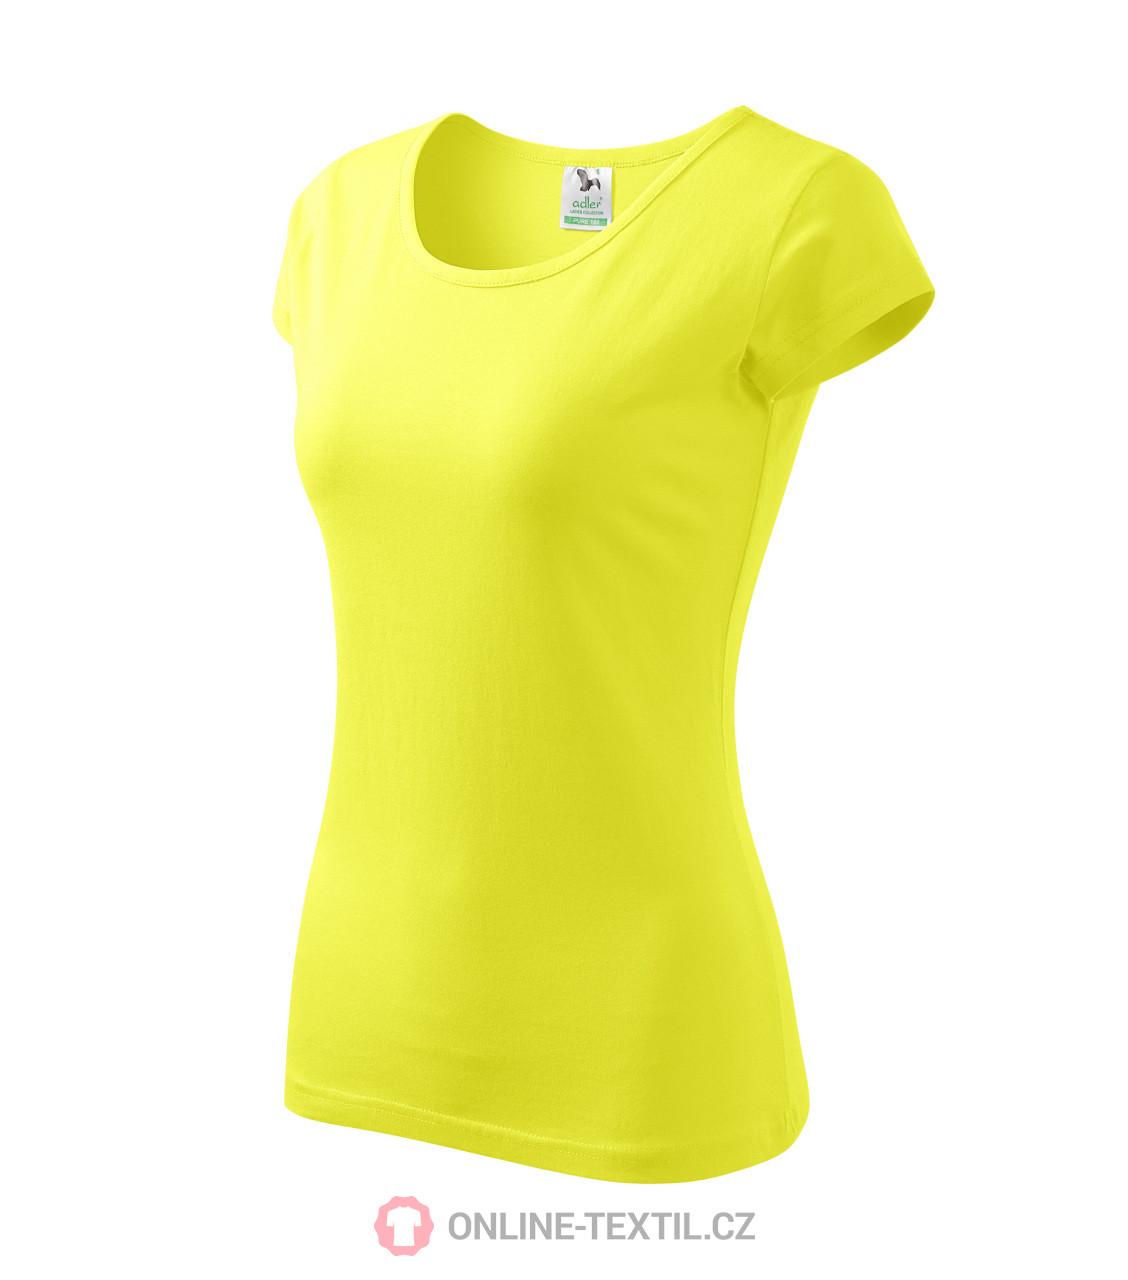 d0609a320 ADLER CZECH Pure tričko dámske A22 - citrónová z kolekcie MALFINI ...